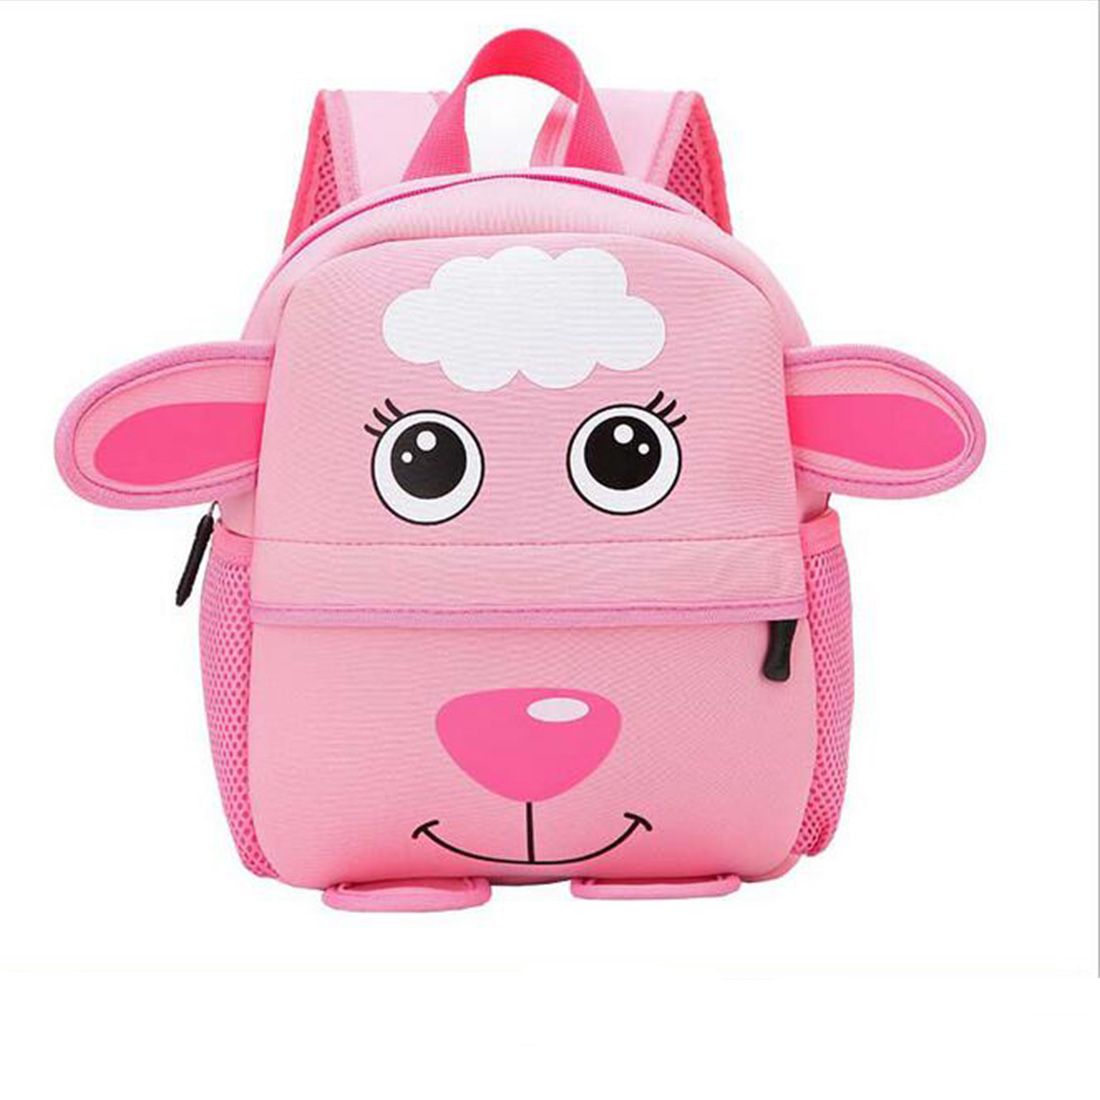 2017 New Cute font b Kids b font School Bags Baby Cartoon Animal font b Backpack